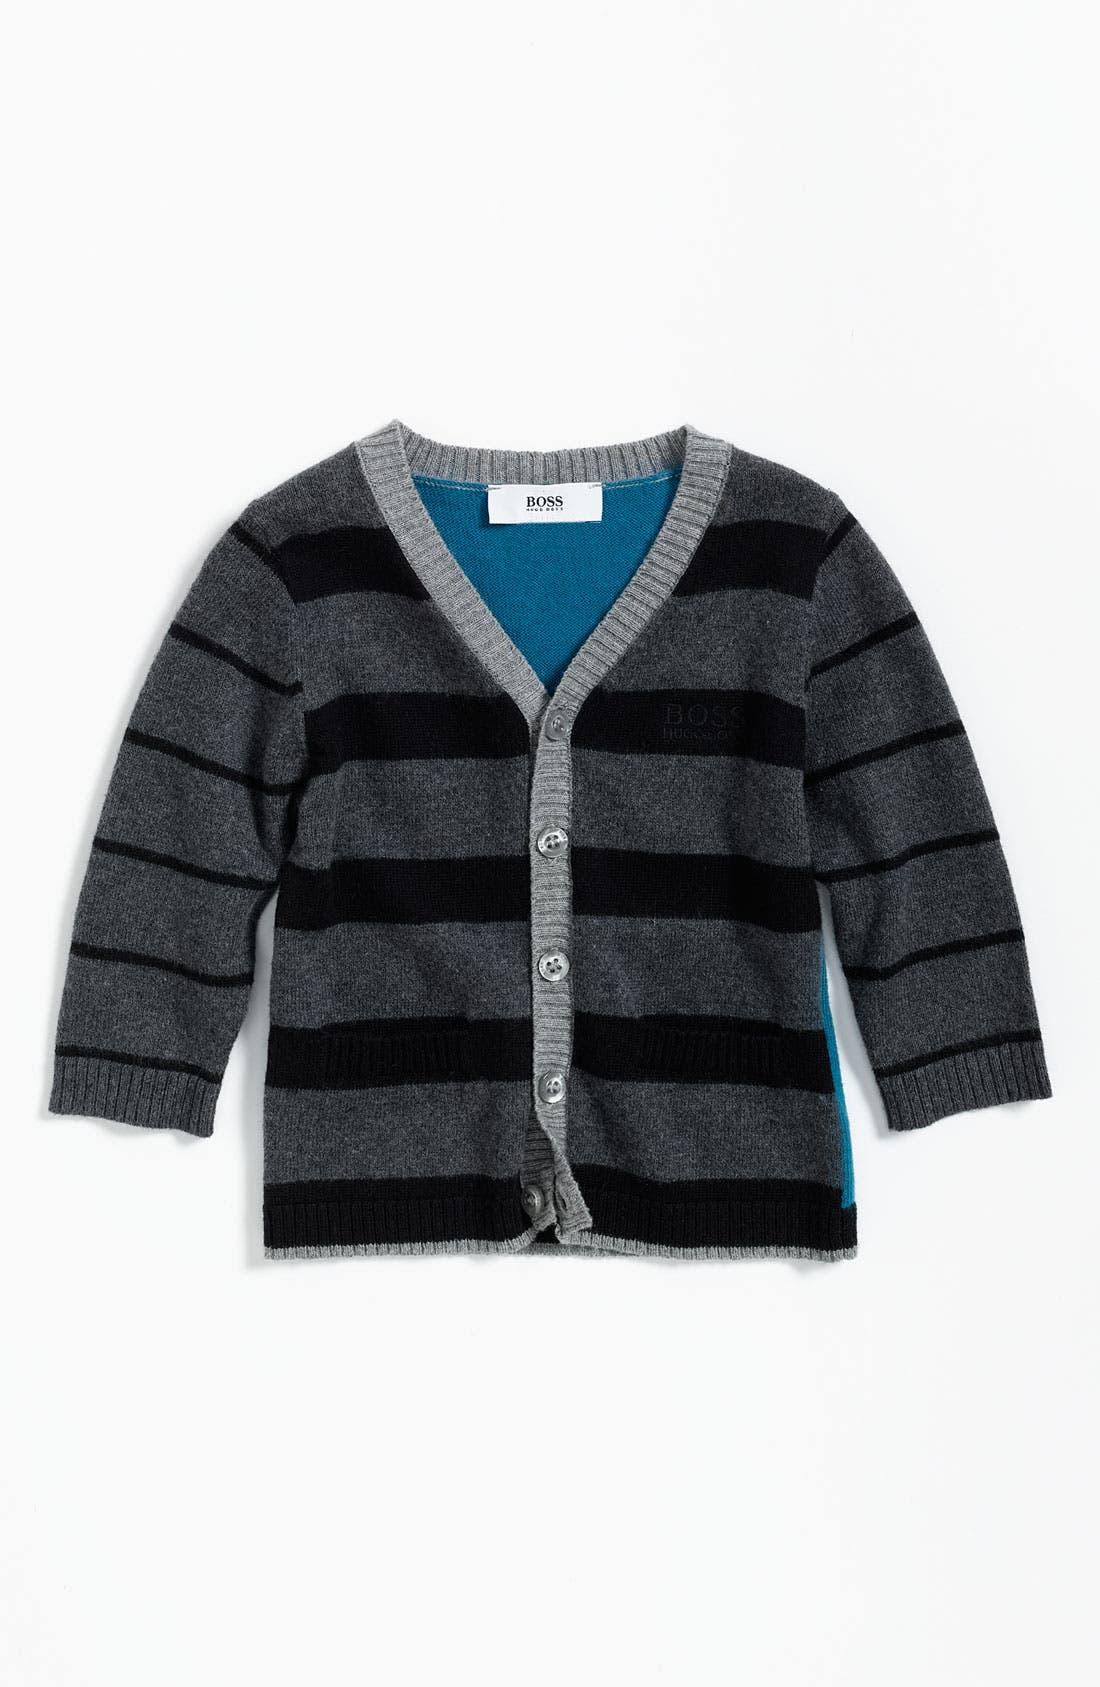 Alternate Image 1 Selected - BOSS Kidswear Stripe Cardigan (Infant)